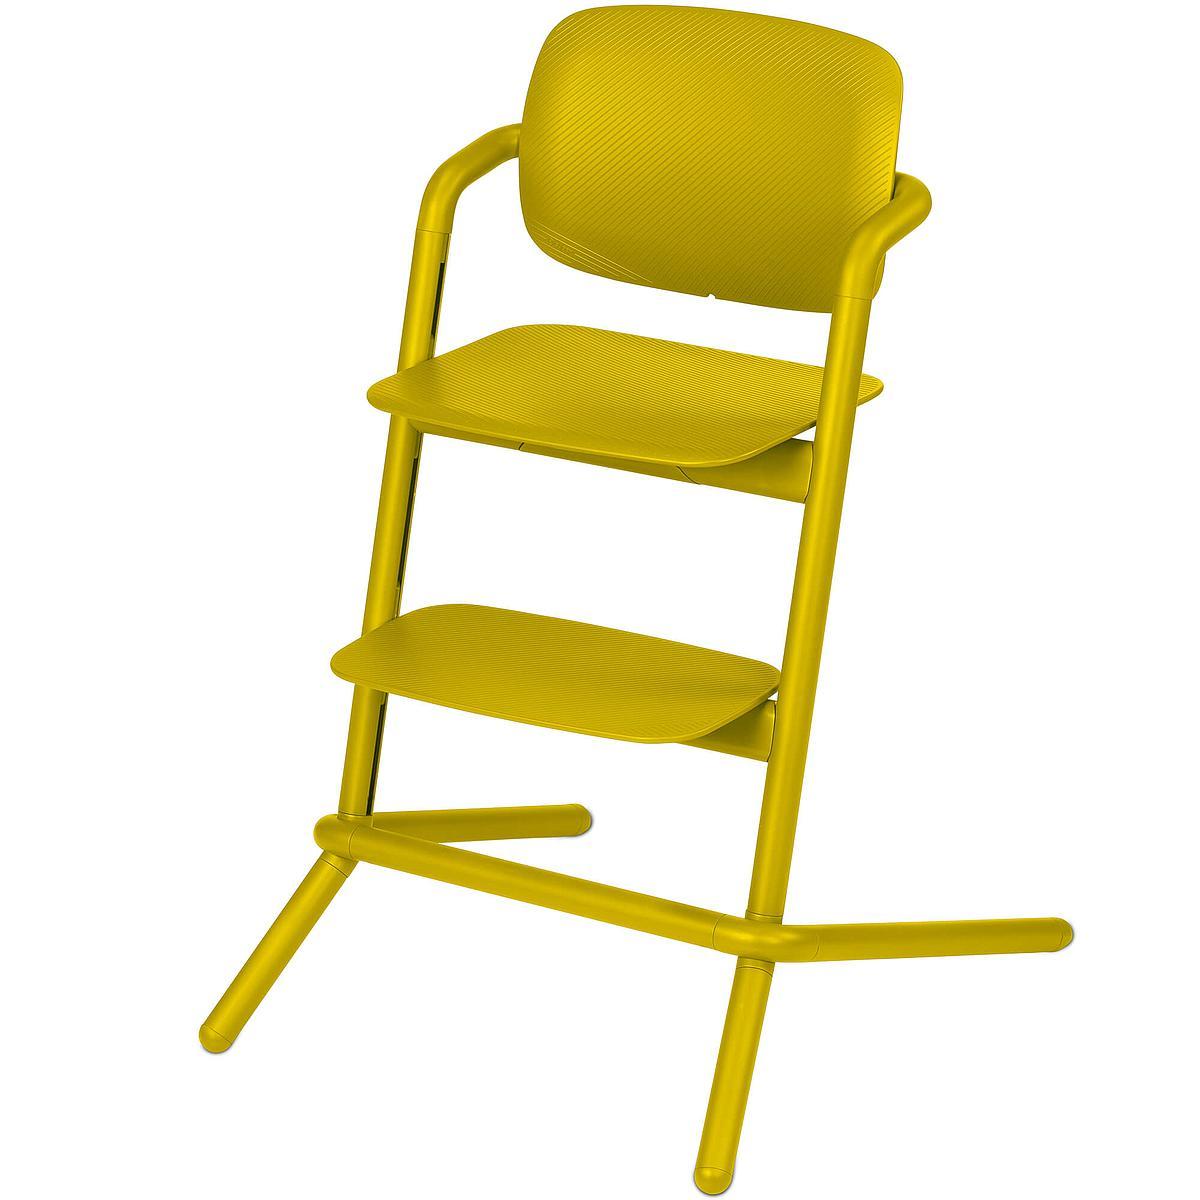 Chaise haute LEMO Cybex canary yellow-yellow